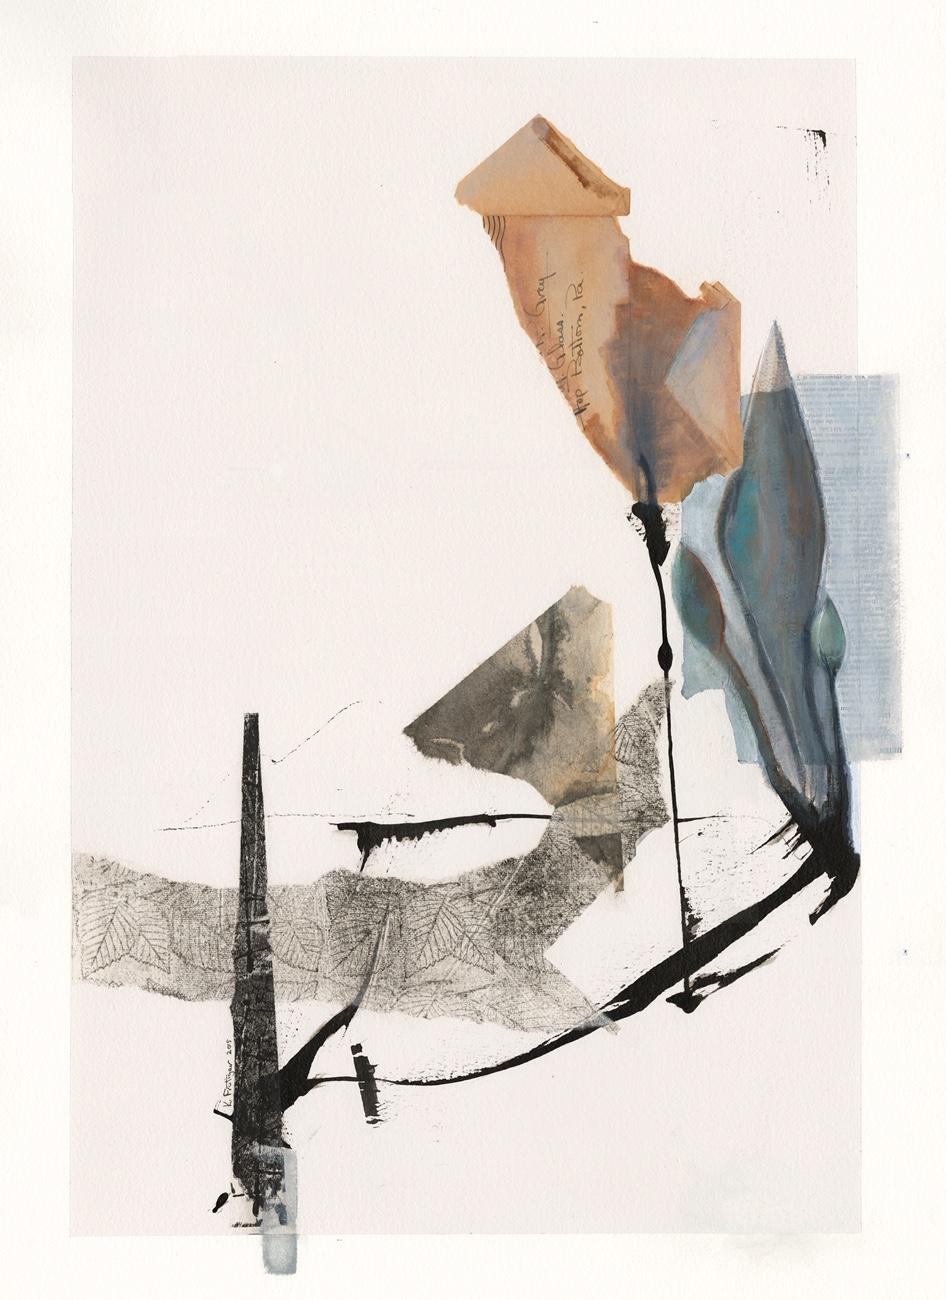 Weathervane by Karen Frutiger